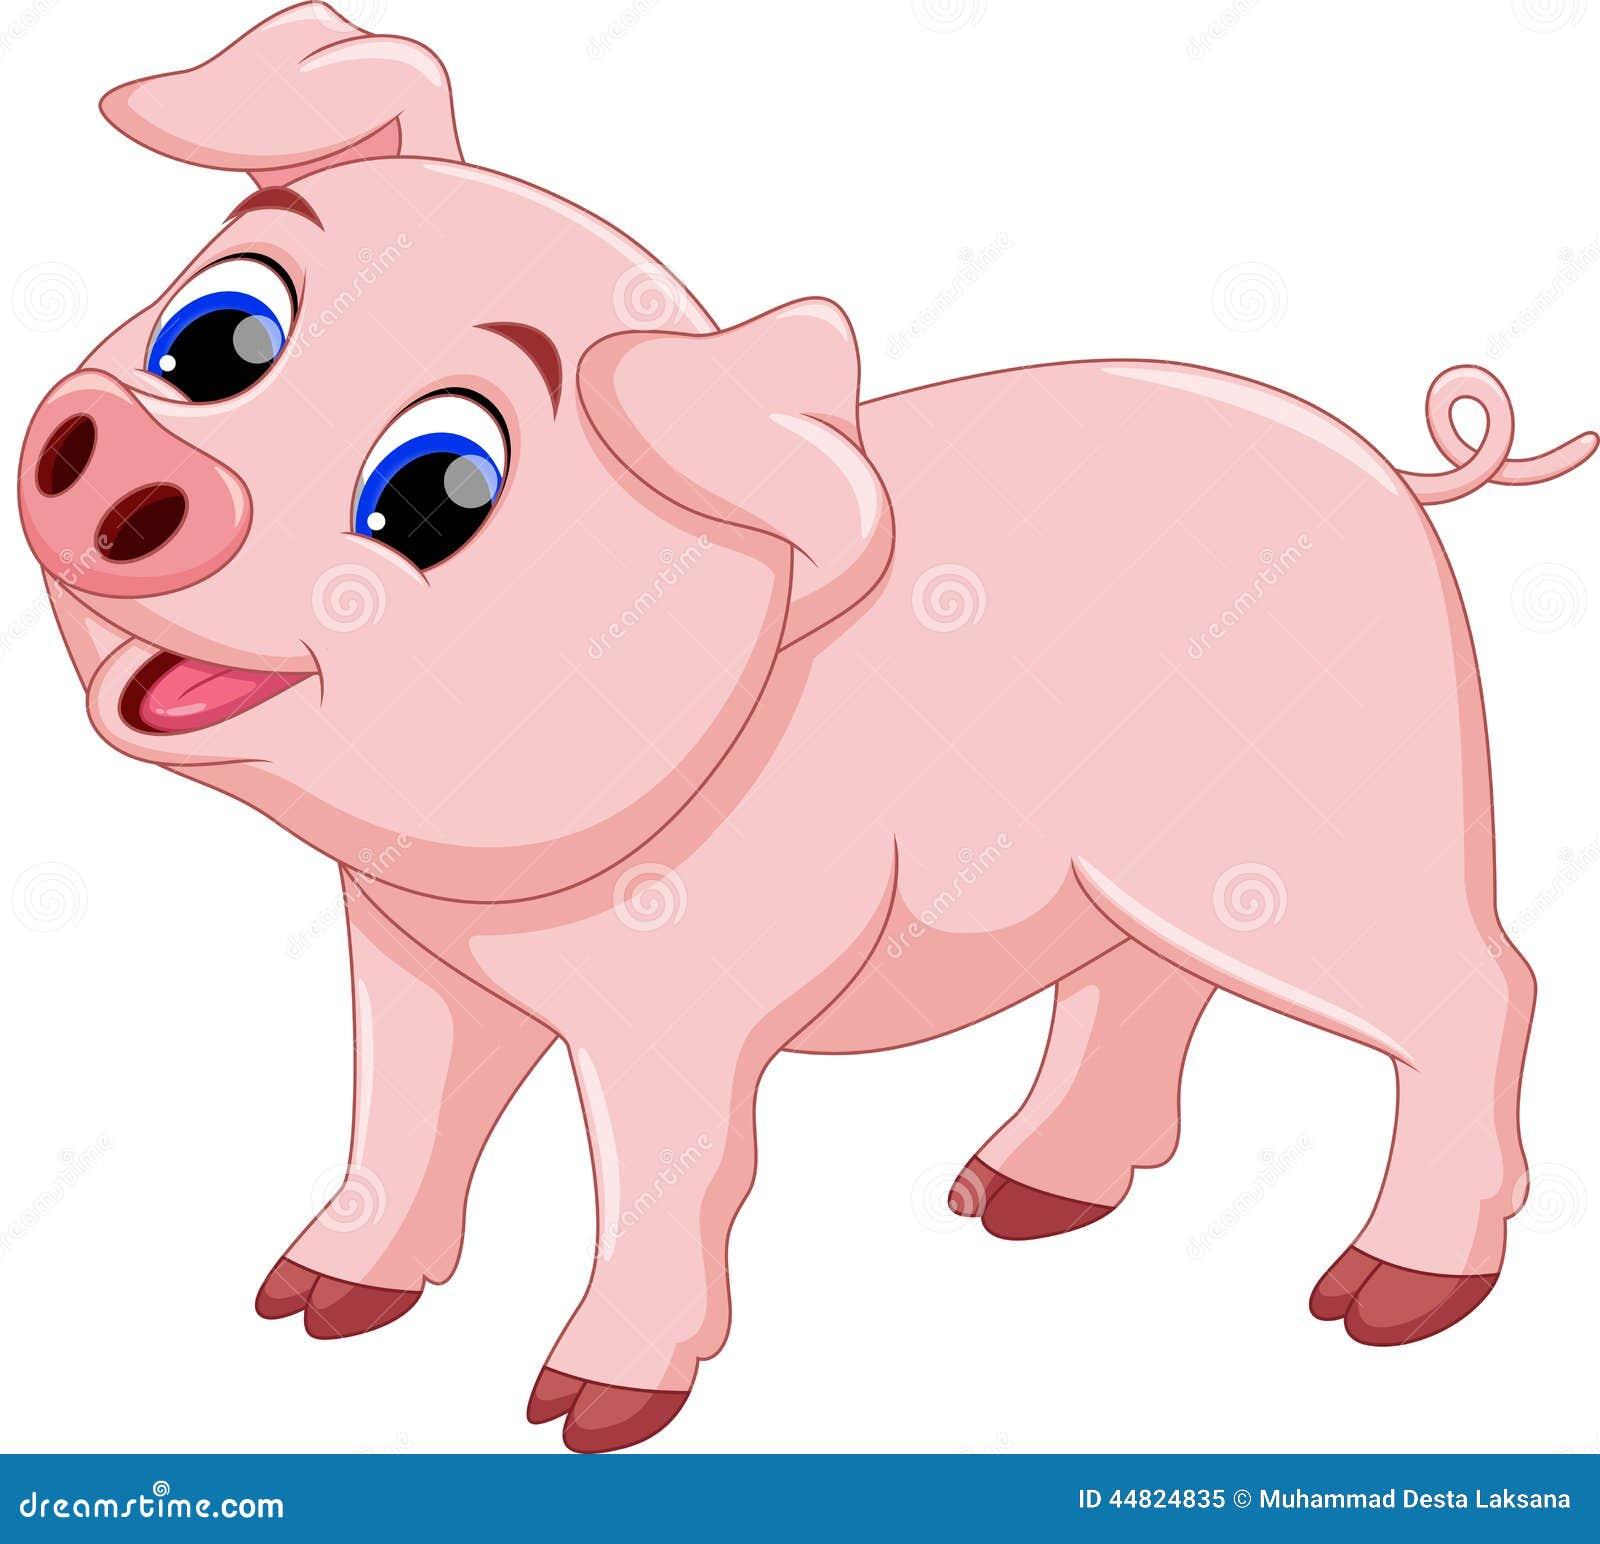 Cute Chef Pig Cartoon Stock Illustration - Image: 44824835